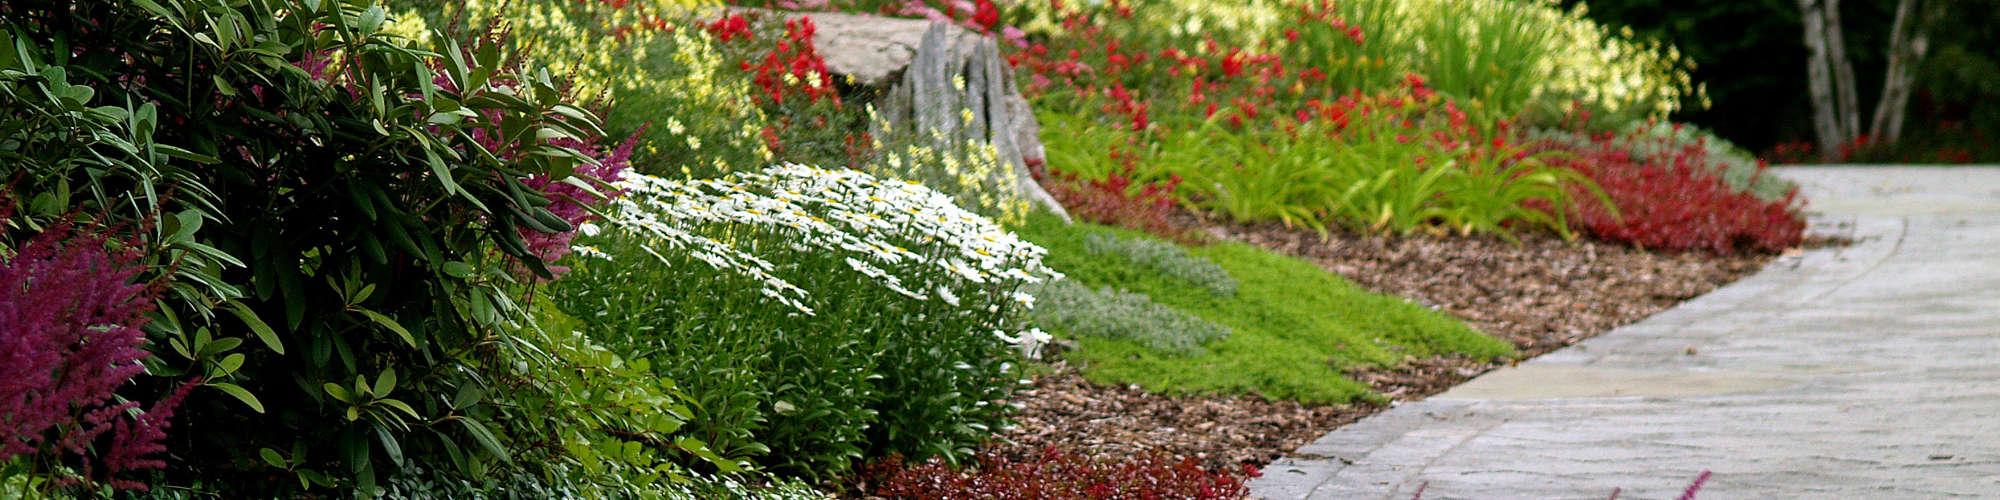 Landscape Design Portfolio - Windscapes Landscaping - Landscape Design Grand Rapids MI